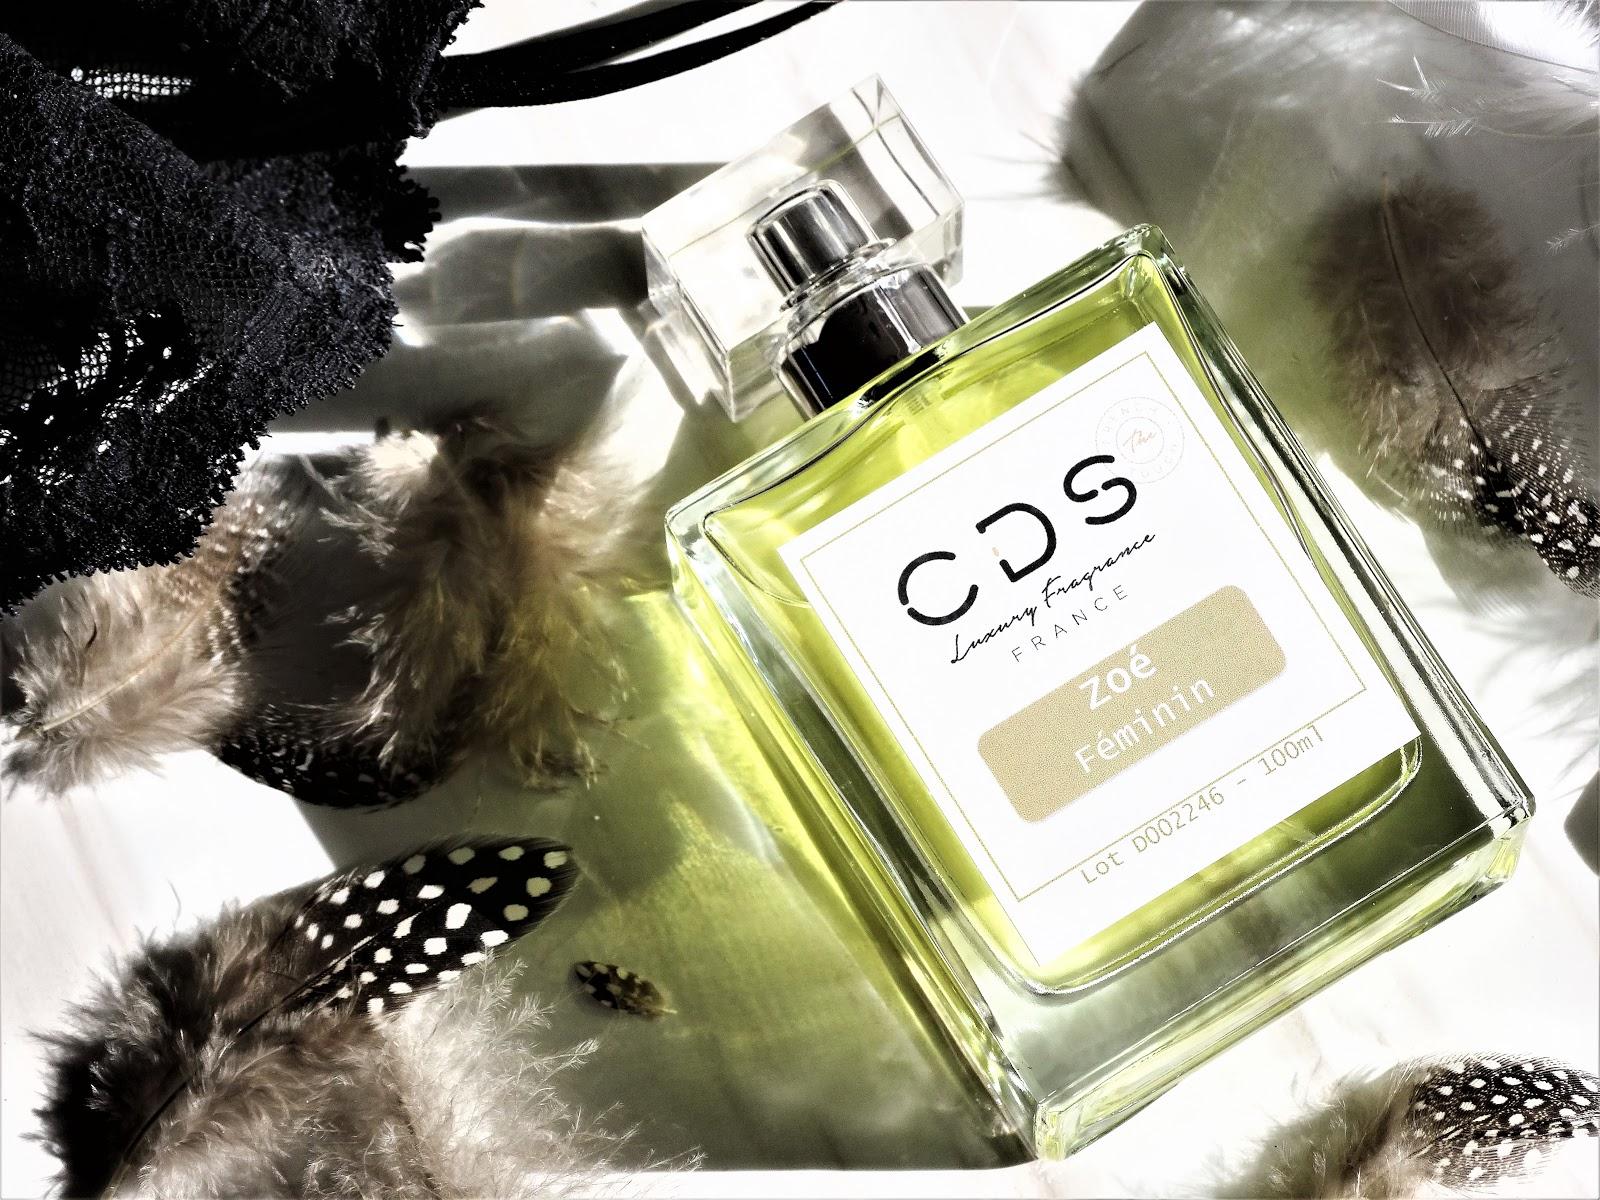 Zoé De Cds France Luxury Fragrance Ambiance Et Fragrance Blog